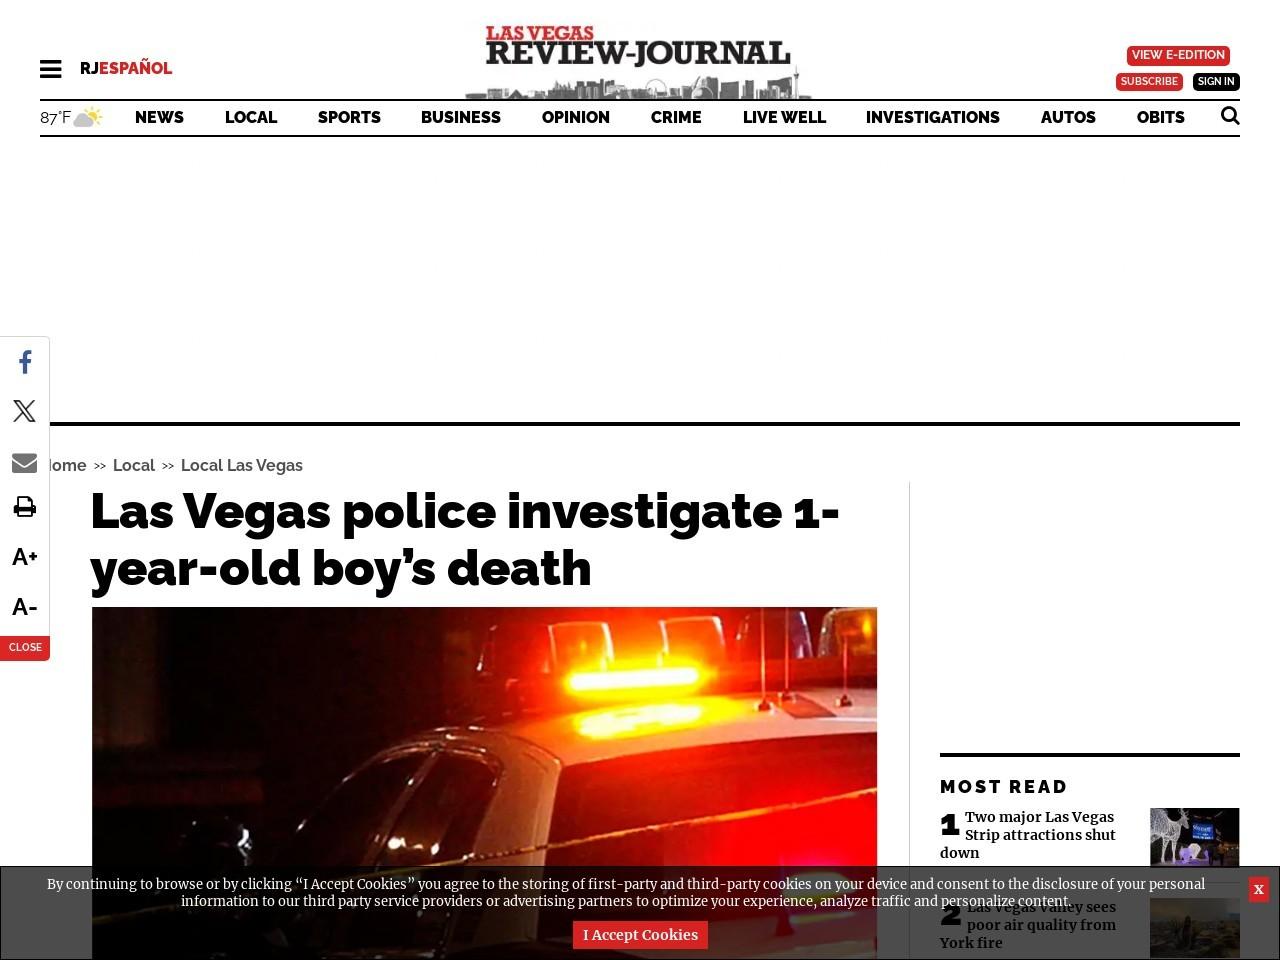 Las Vegas police investigate 1-year-old boy's death